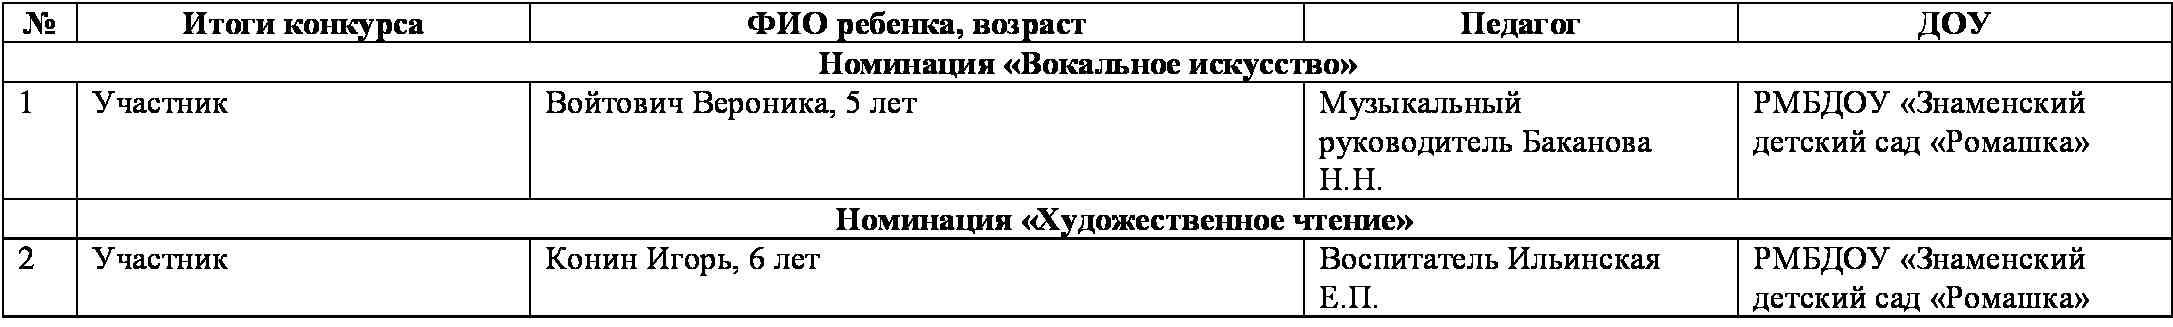 Документ-Microsoft-Office-Word-копия